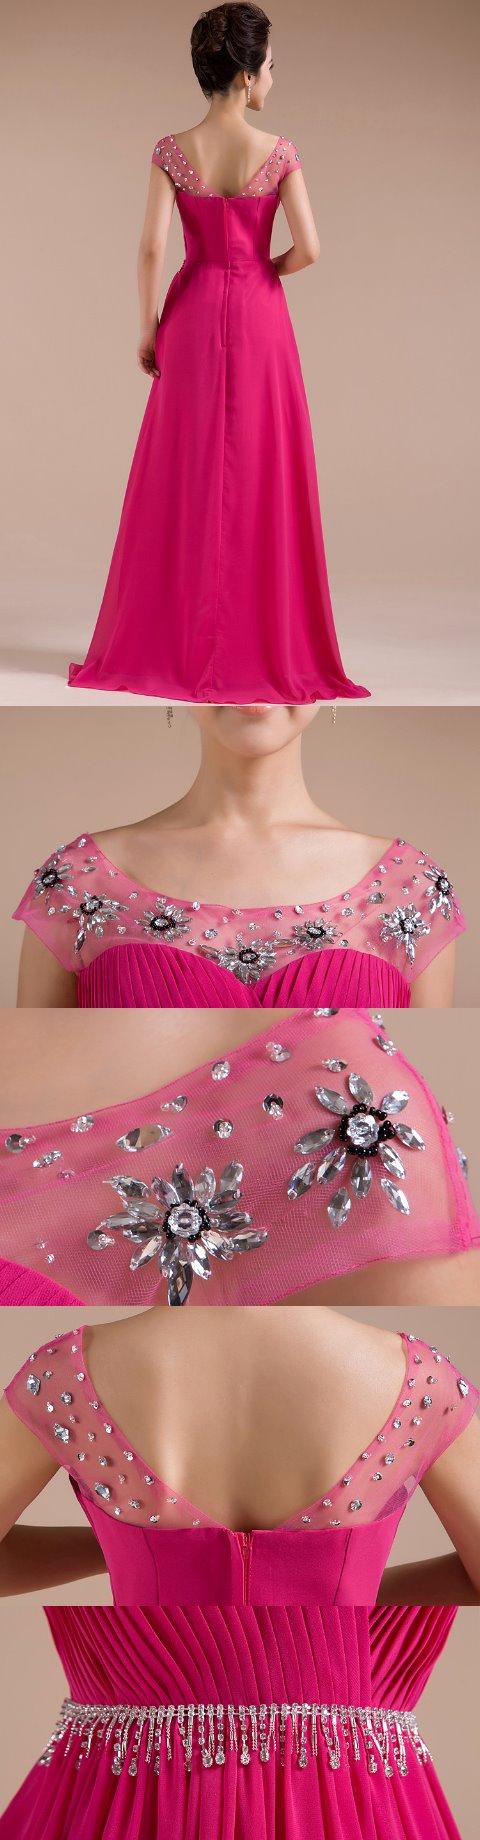 Sleeveless Long-length Prom Dress (RM)